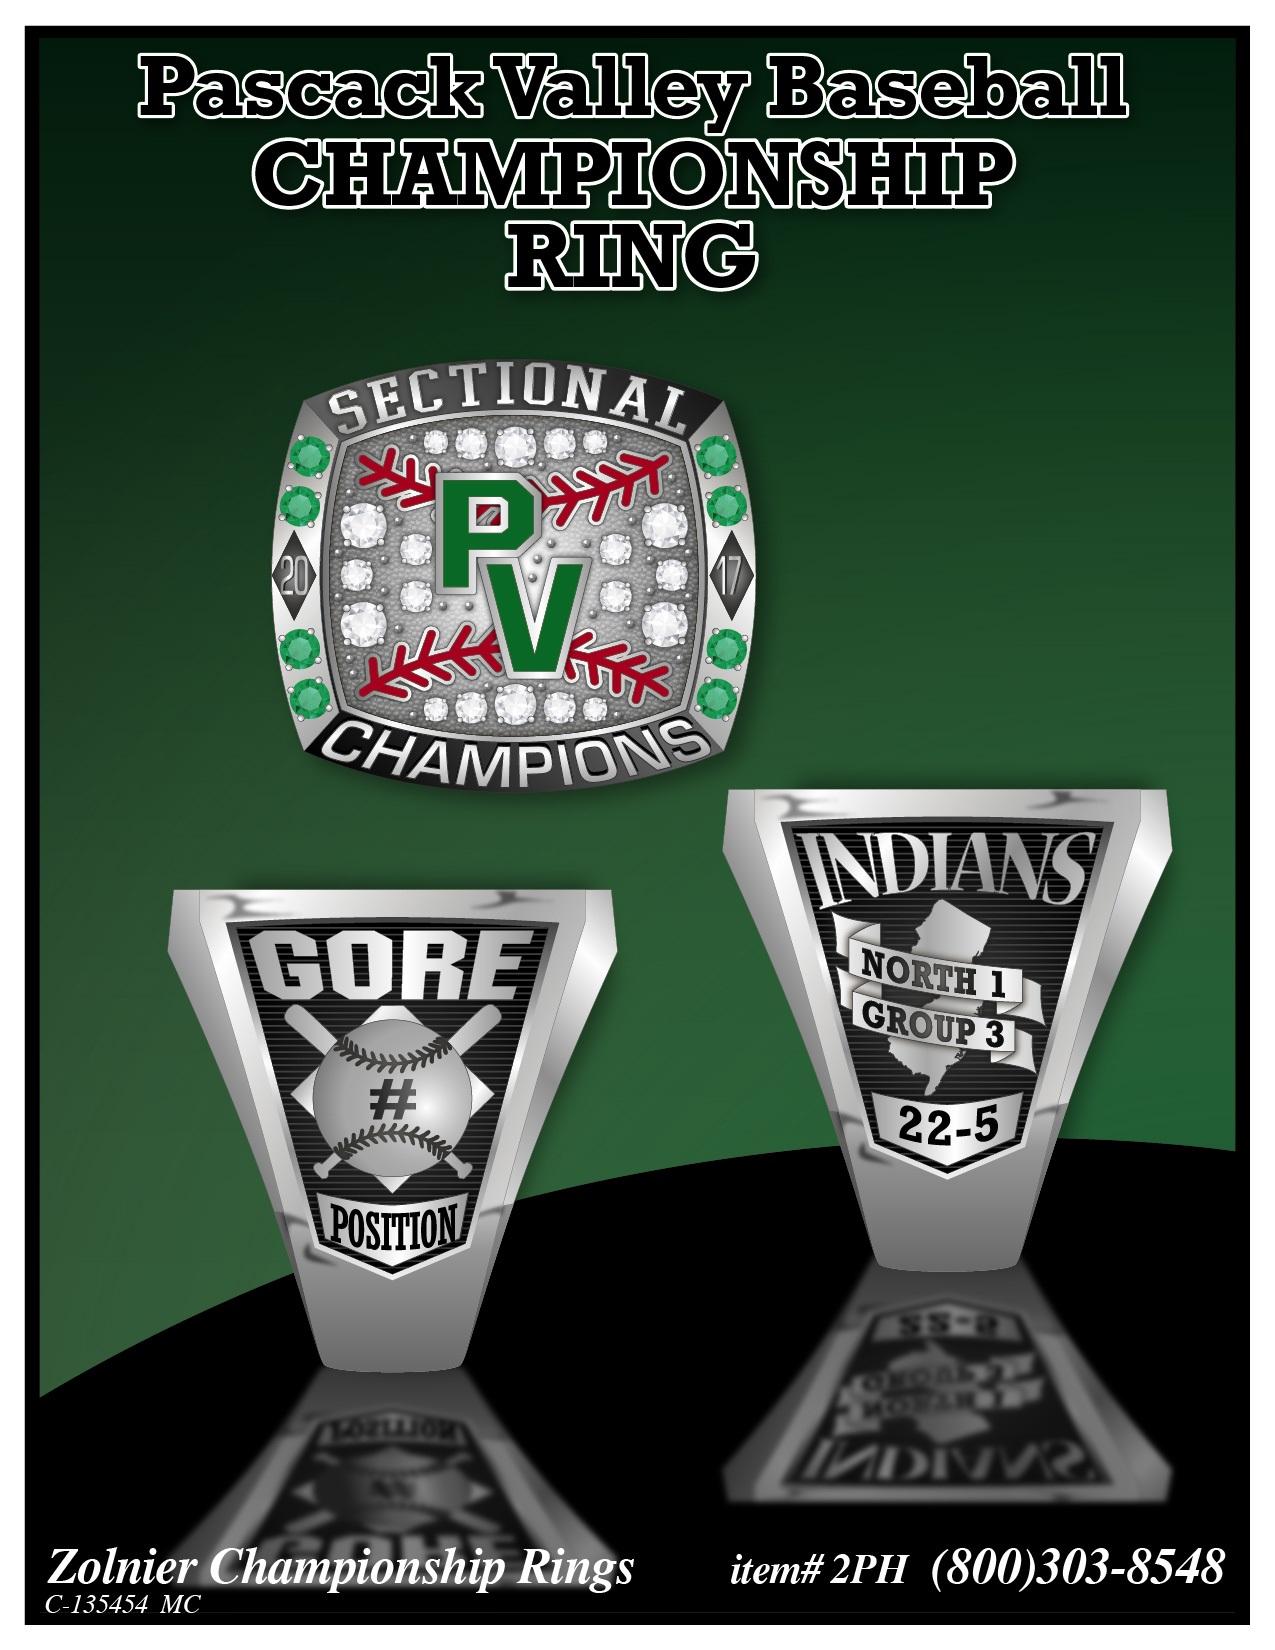 C-135454 Pascack Valley Baseball Champ Ring